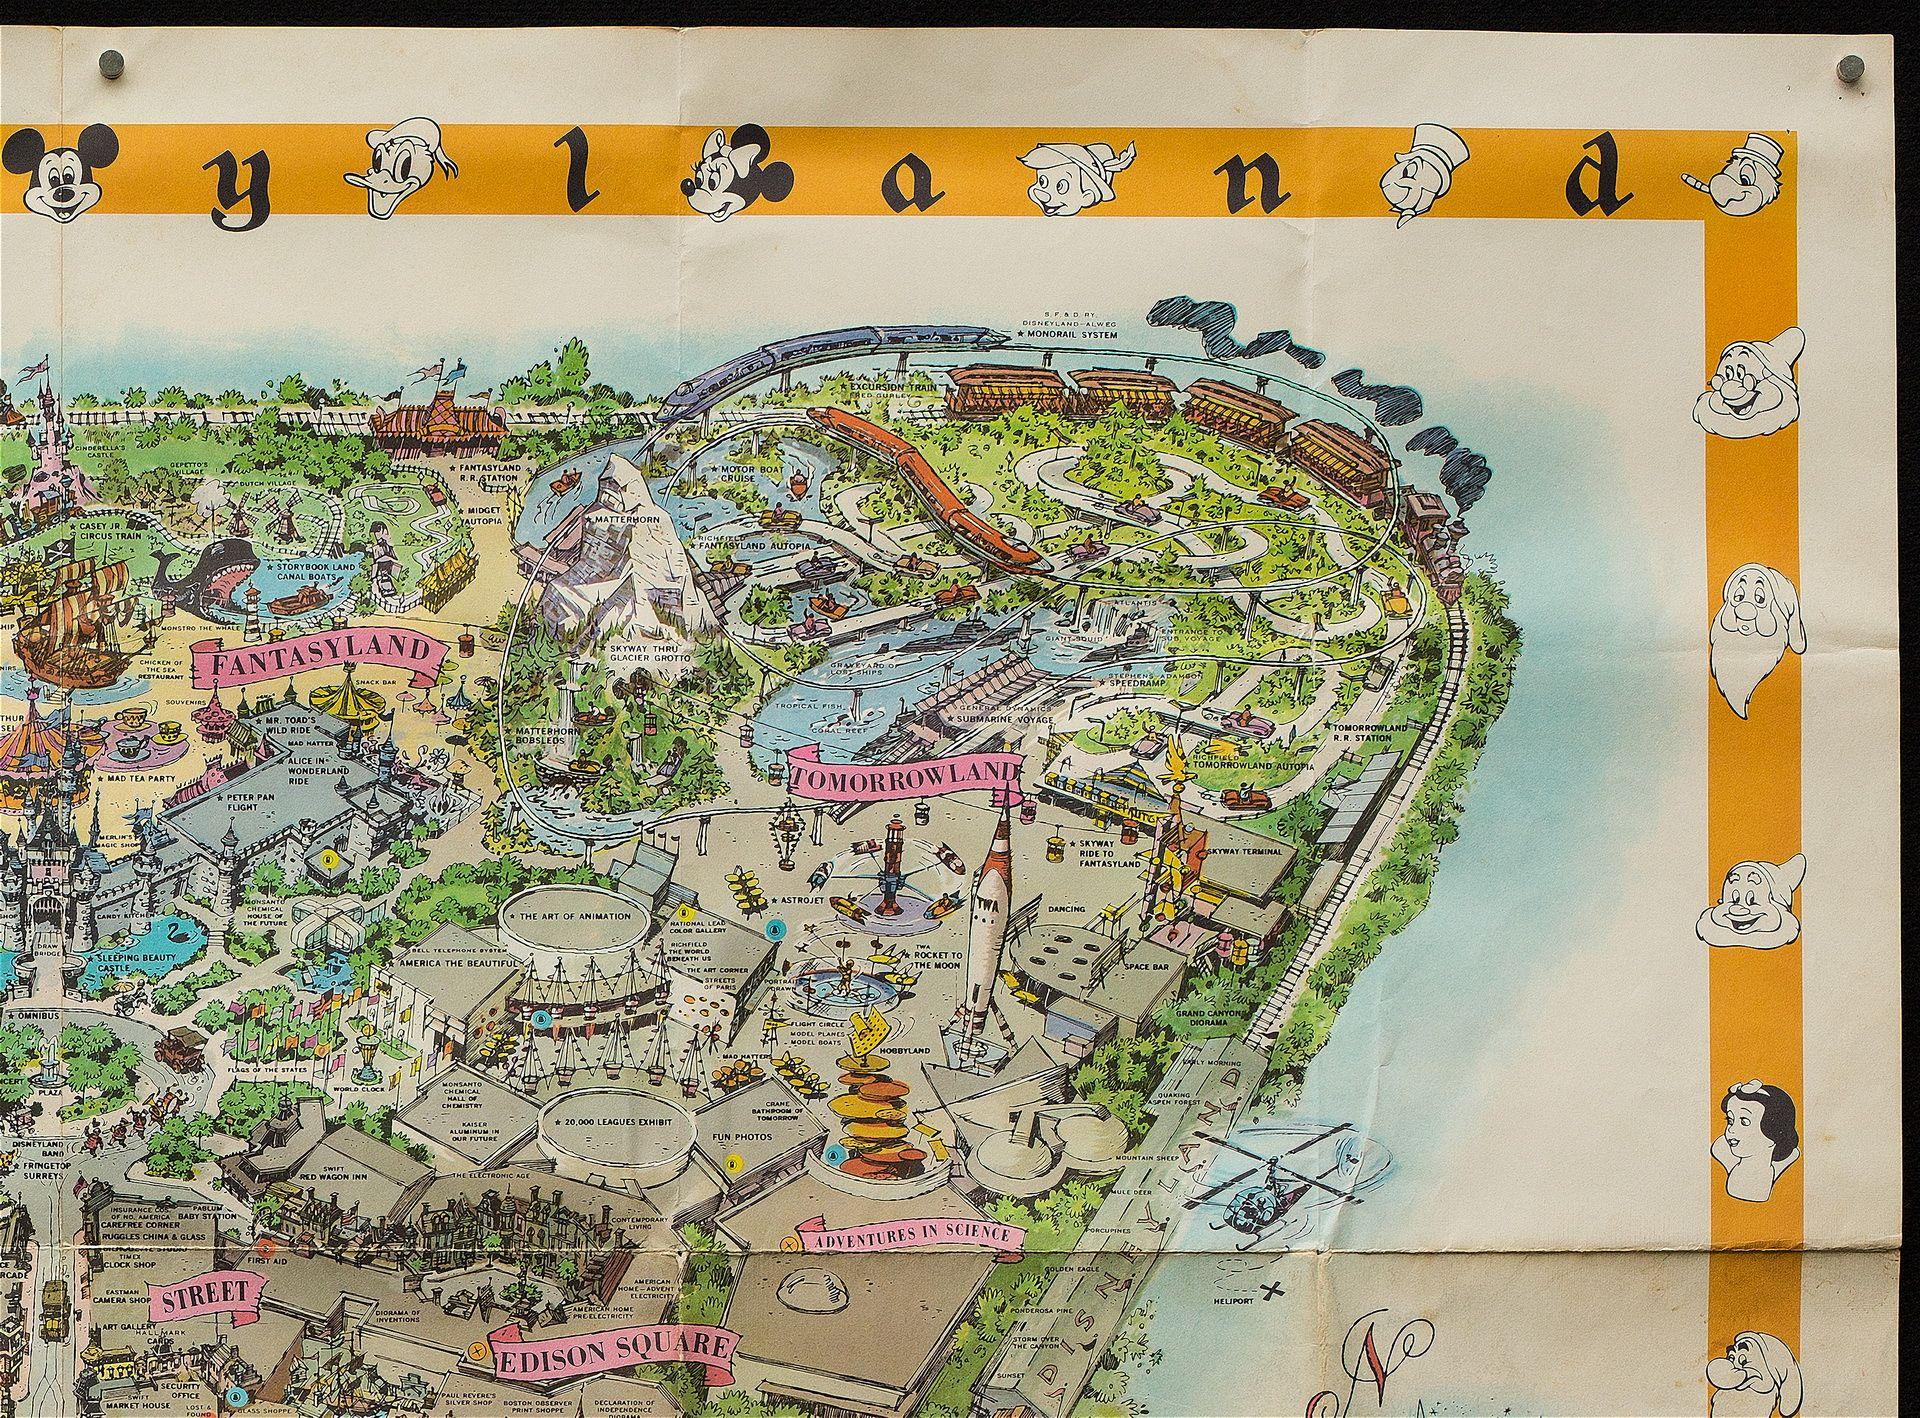 Rare Vintage Original 1958 Disneyland Theme Park Souvenir Map